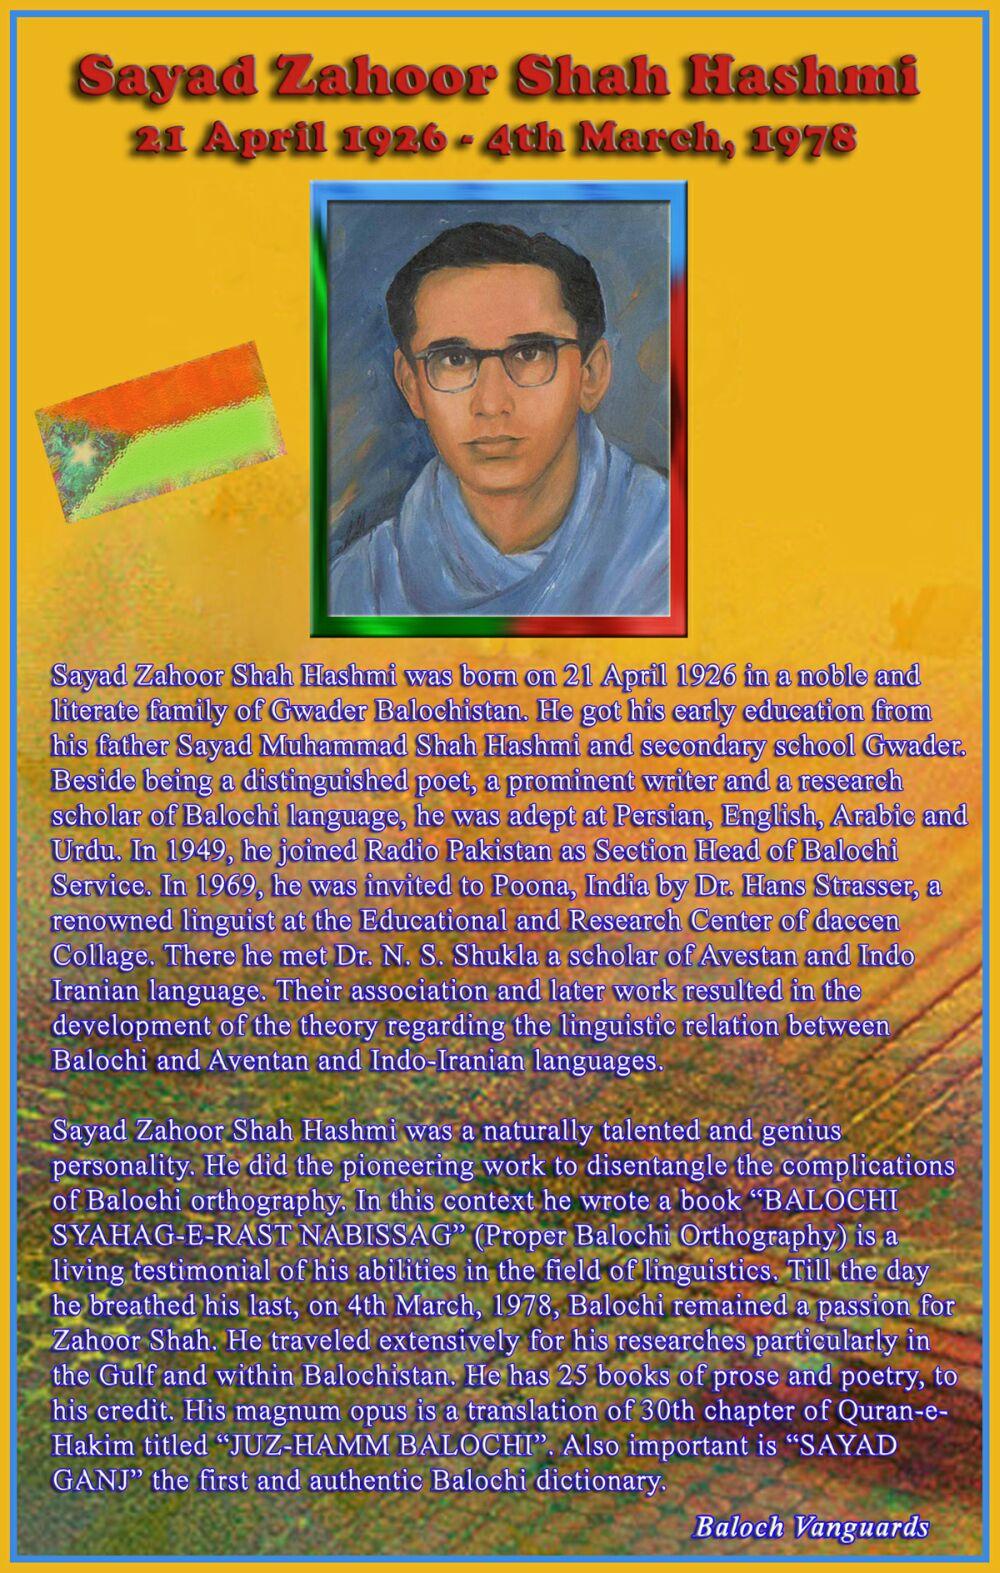 http://baluchsarmachar.files.wordpress.com/2010/03/mar4-sayad-zahoor-shah-hashmi.jpg